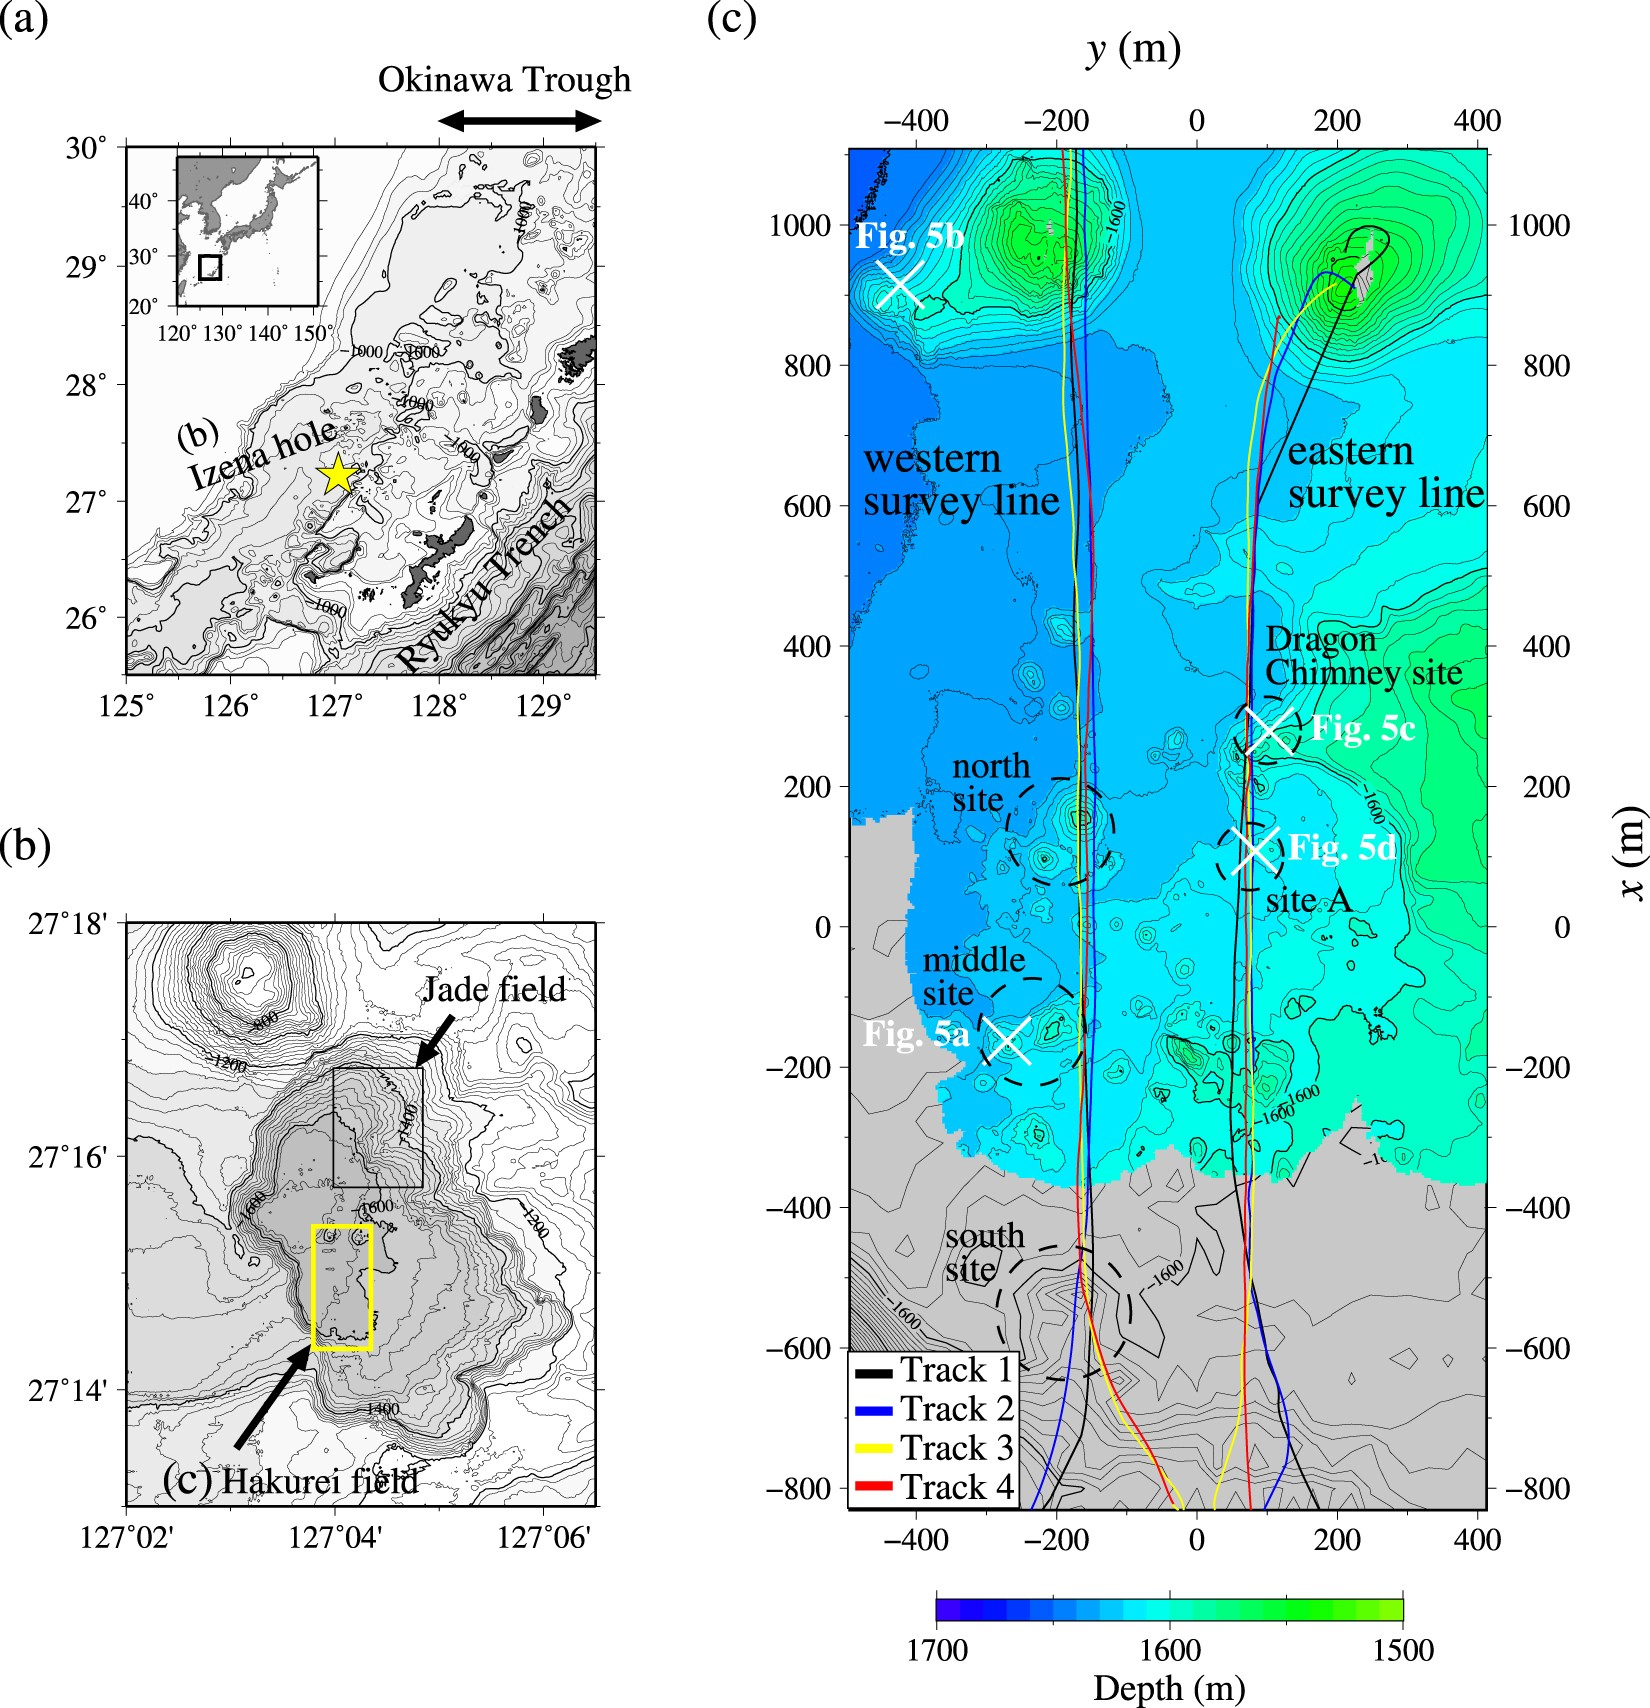 Marine self-potential survey for exploring seafloor